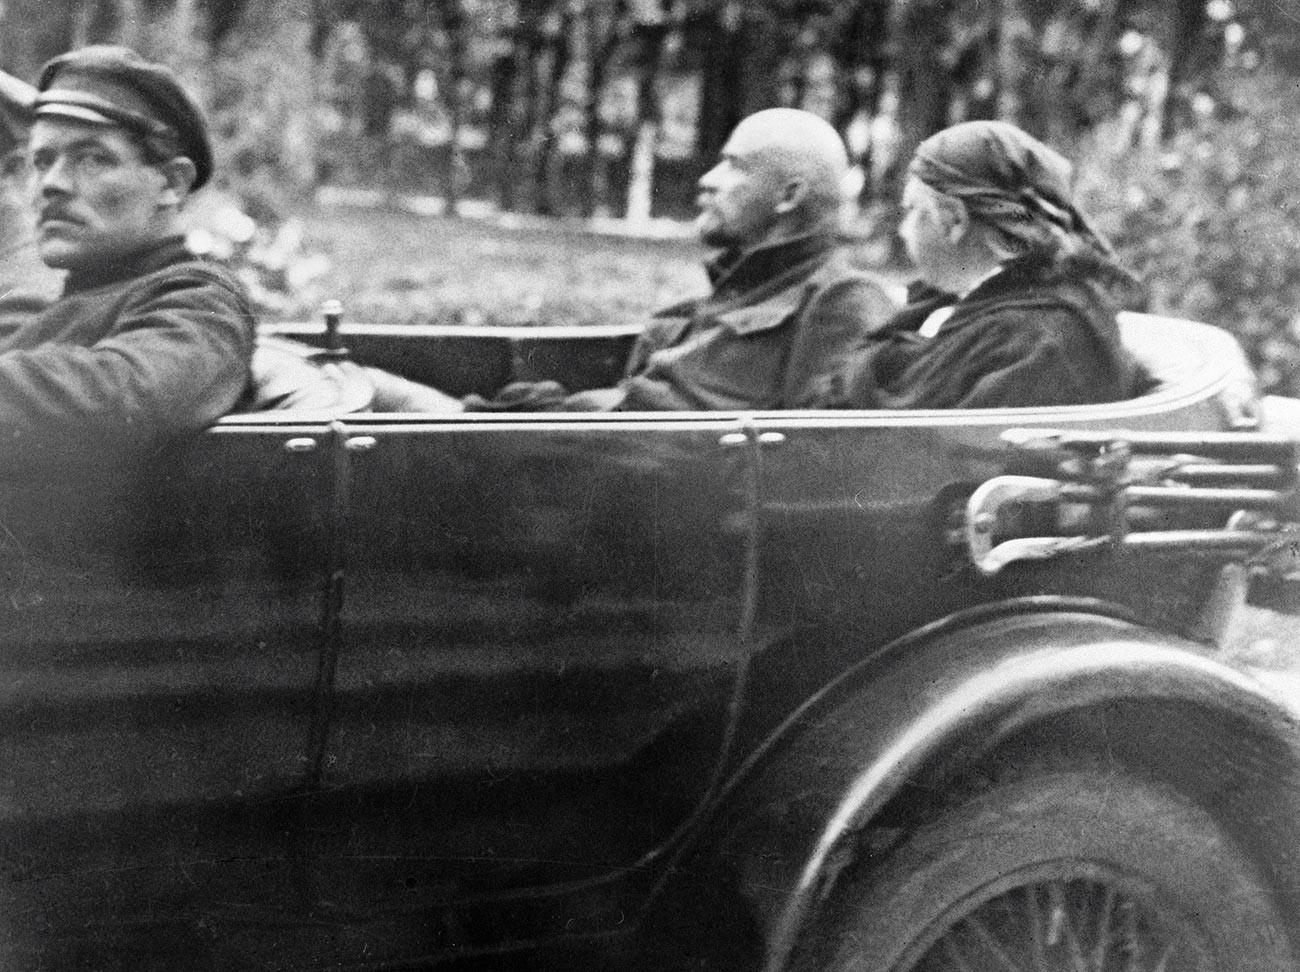 Vladimir Lénine et sa femme Nadejda Kroupskaïa